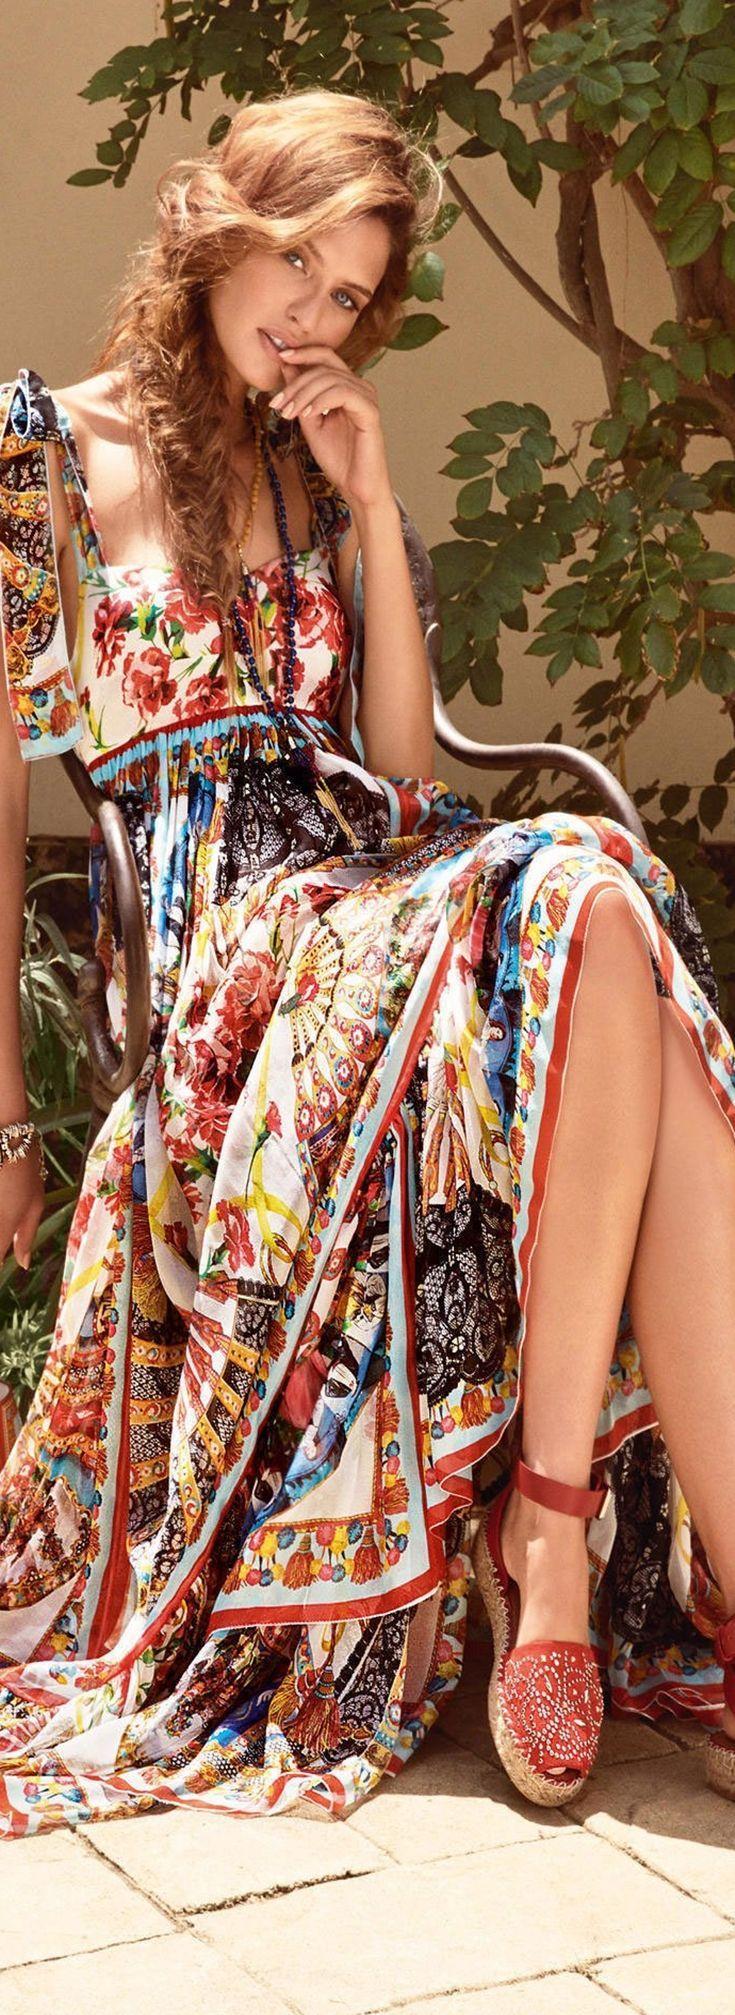 Bohemian Clothing Women | www.imgkid.com - The Image Kid ...